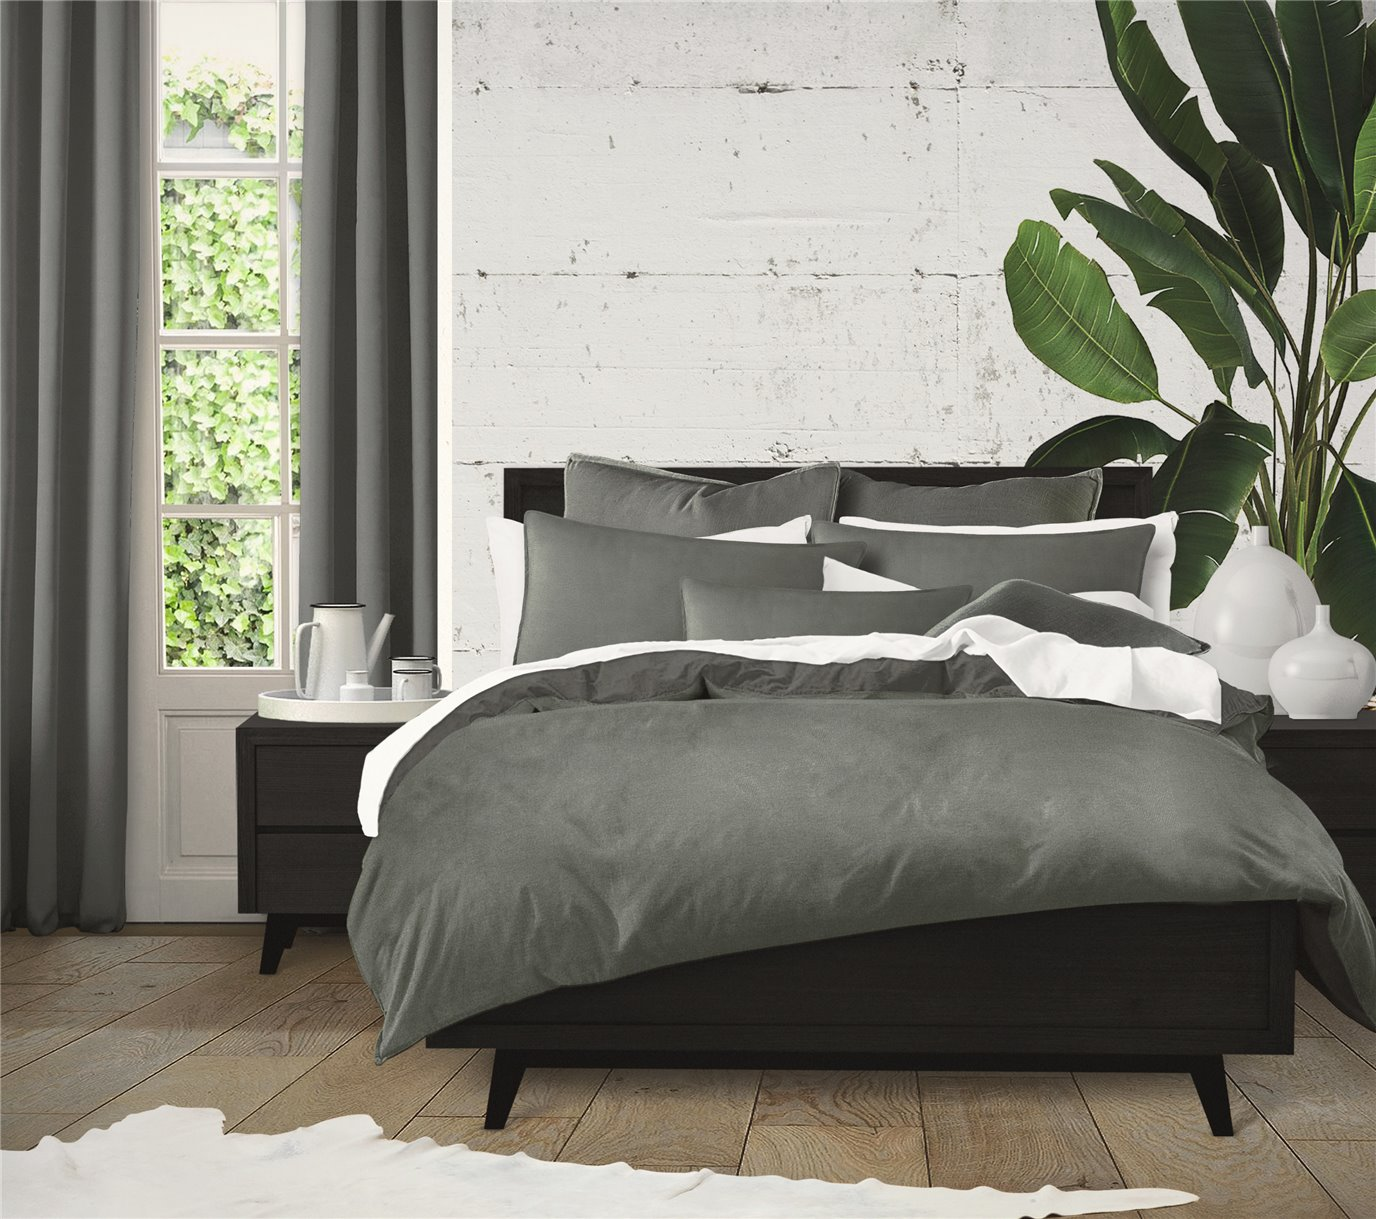 Harrow Charcoal Comforter Set - Super King